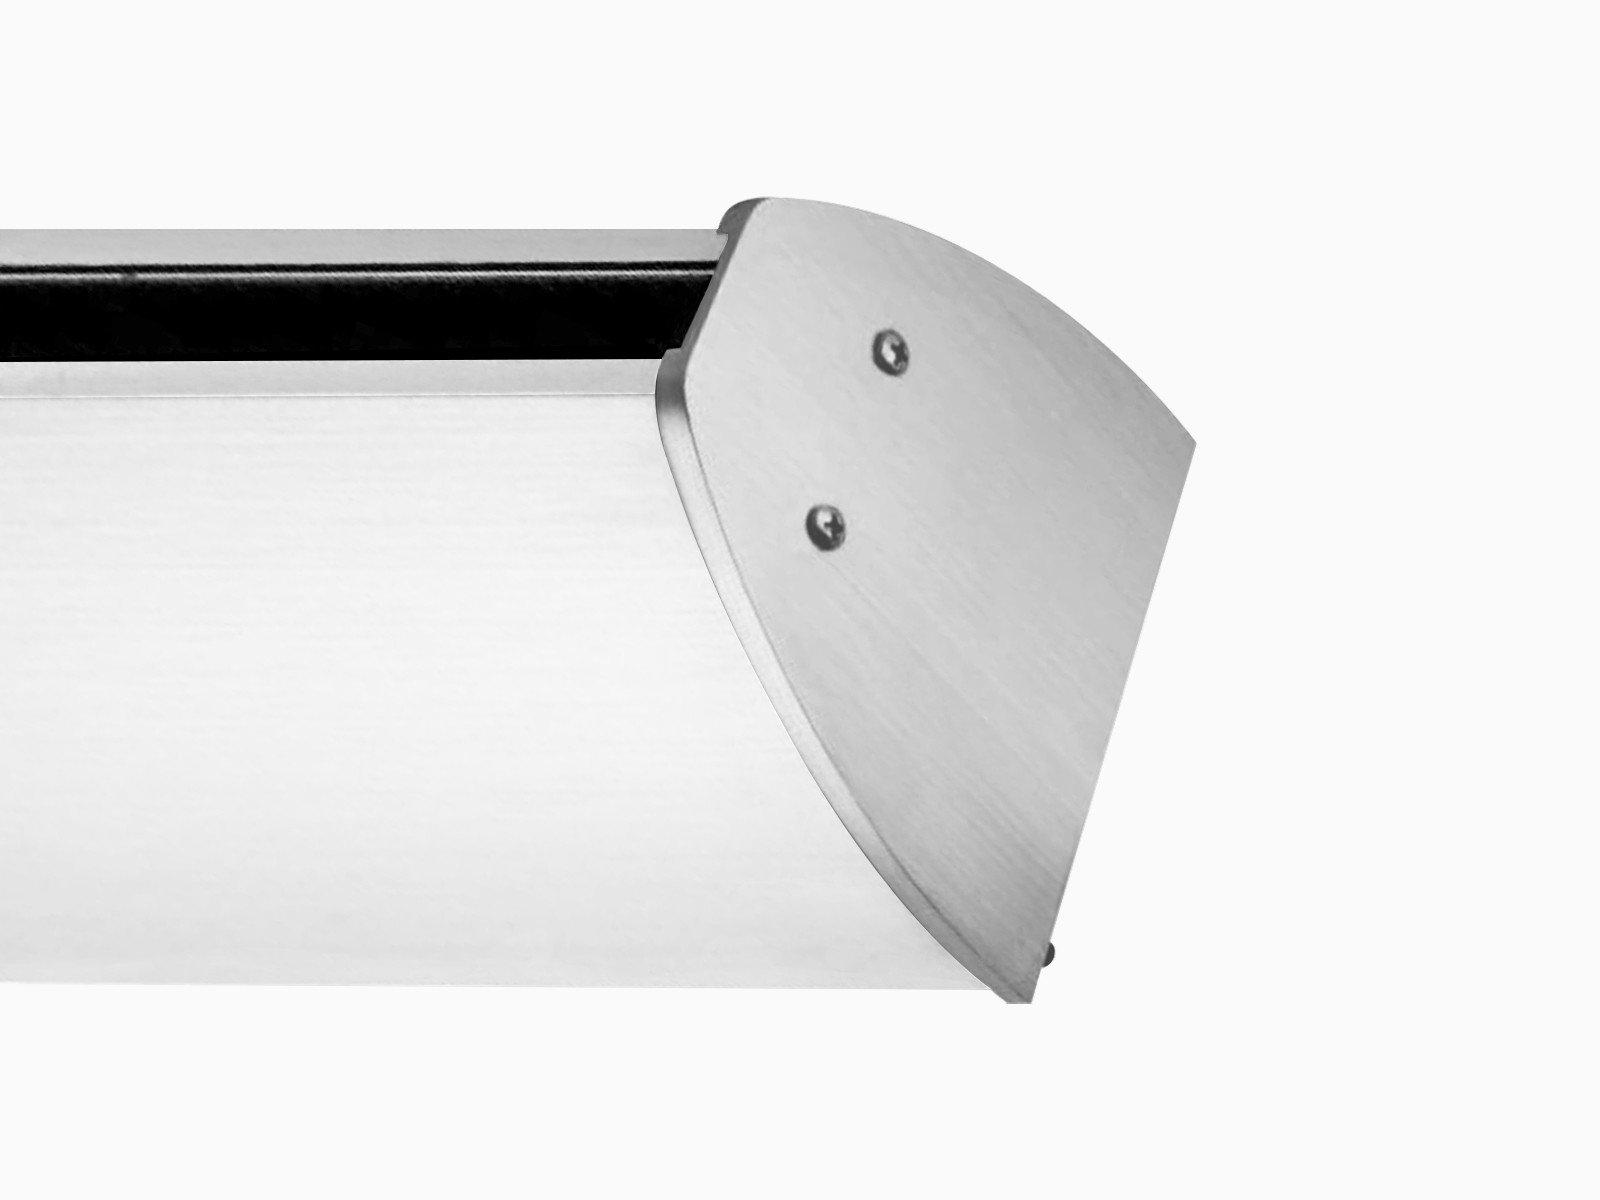 klemmprofil-oval-glaszaunsystem-mit-abdeckblende-und-endkappe